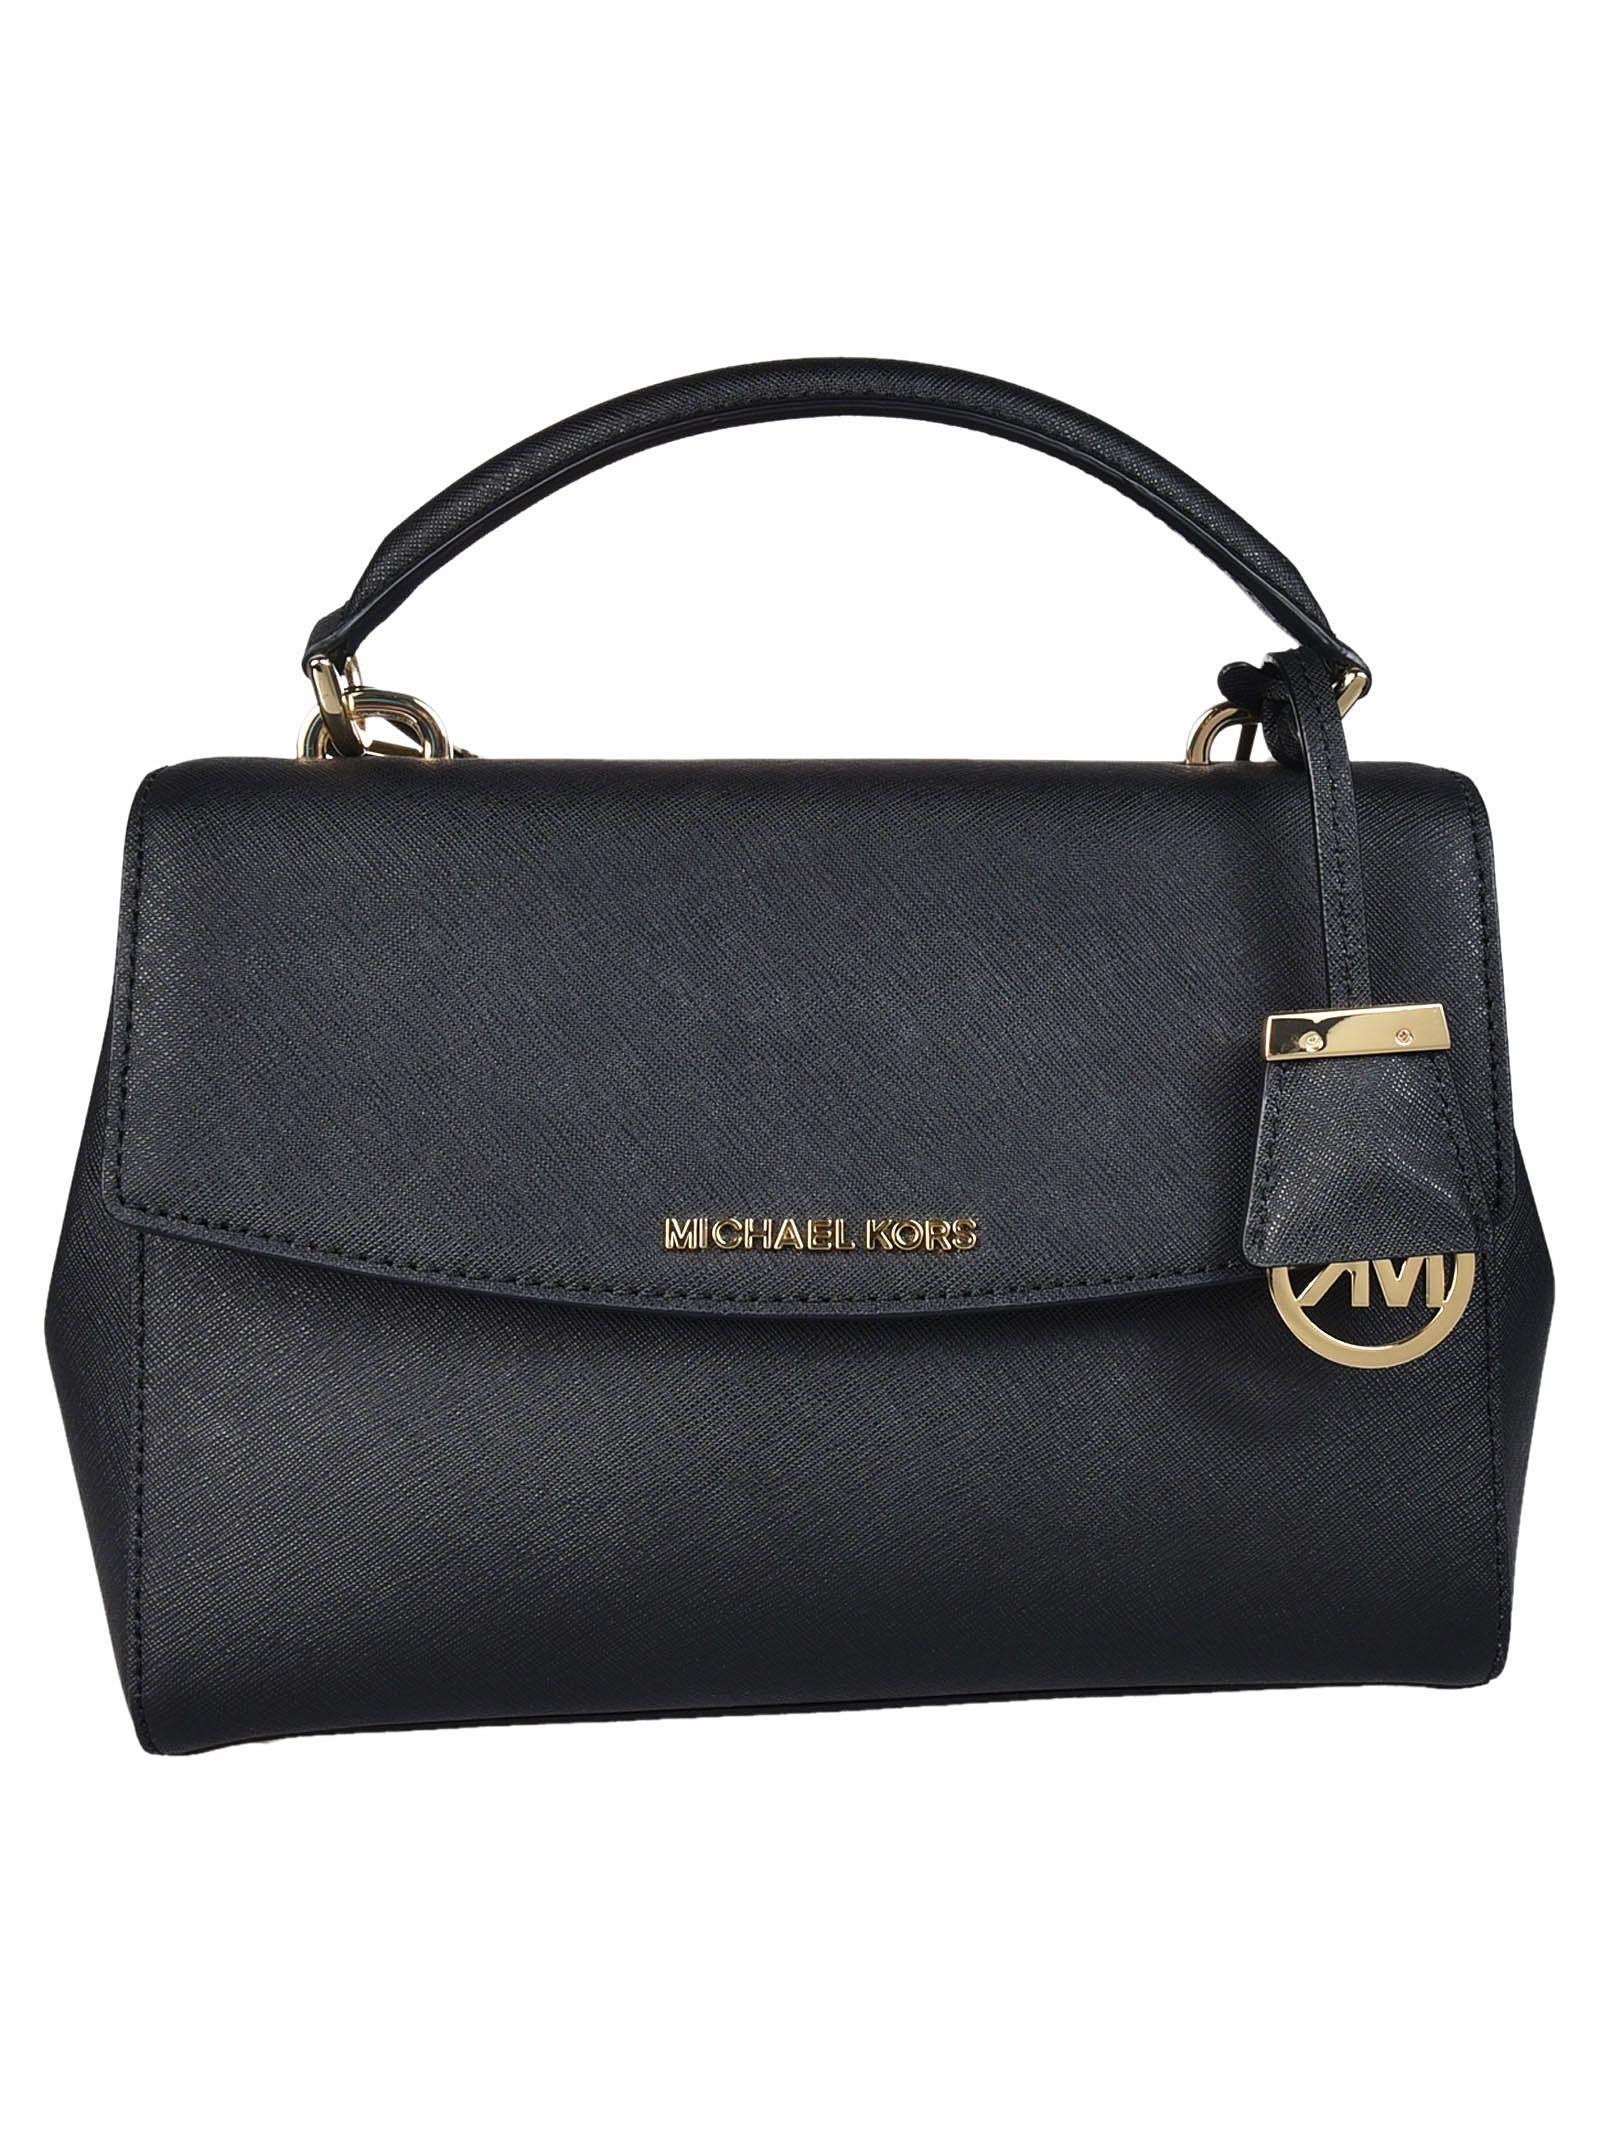 Michael Kors Ava Shoulder Bag